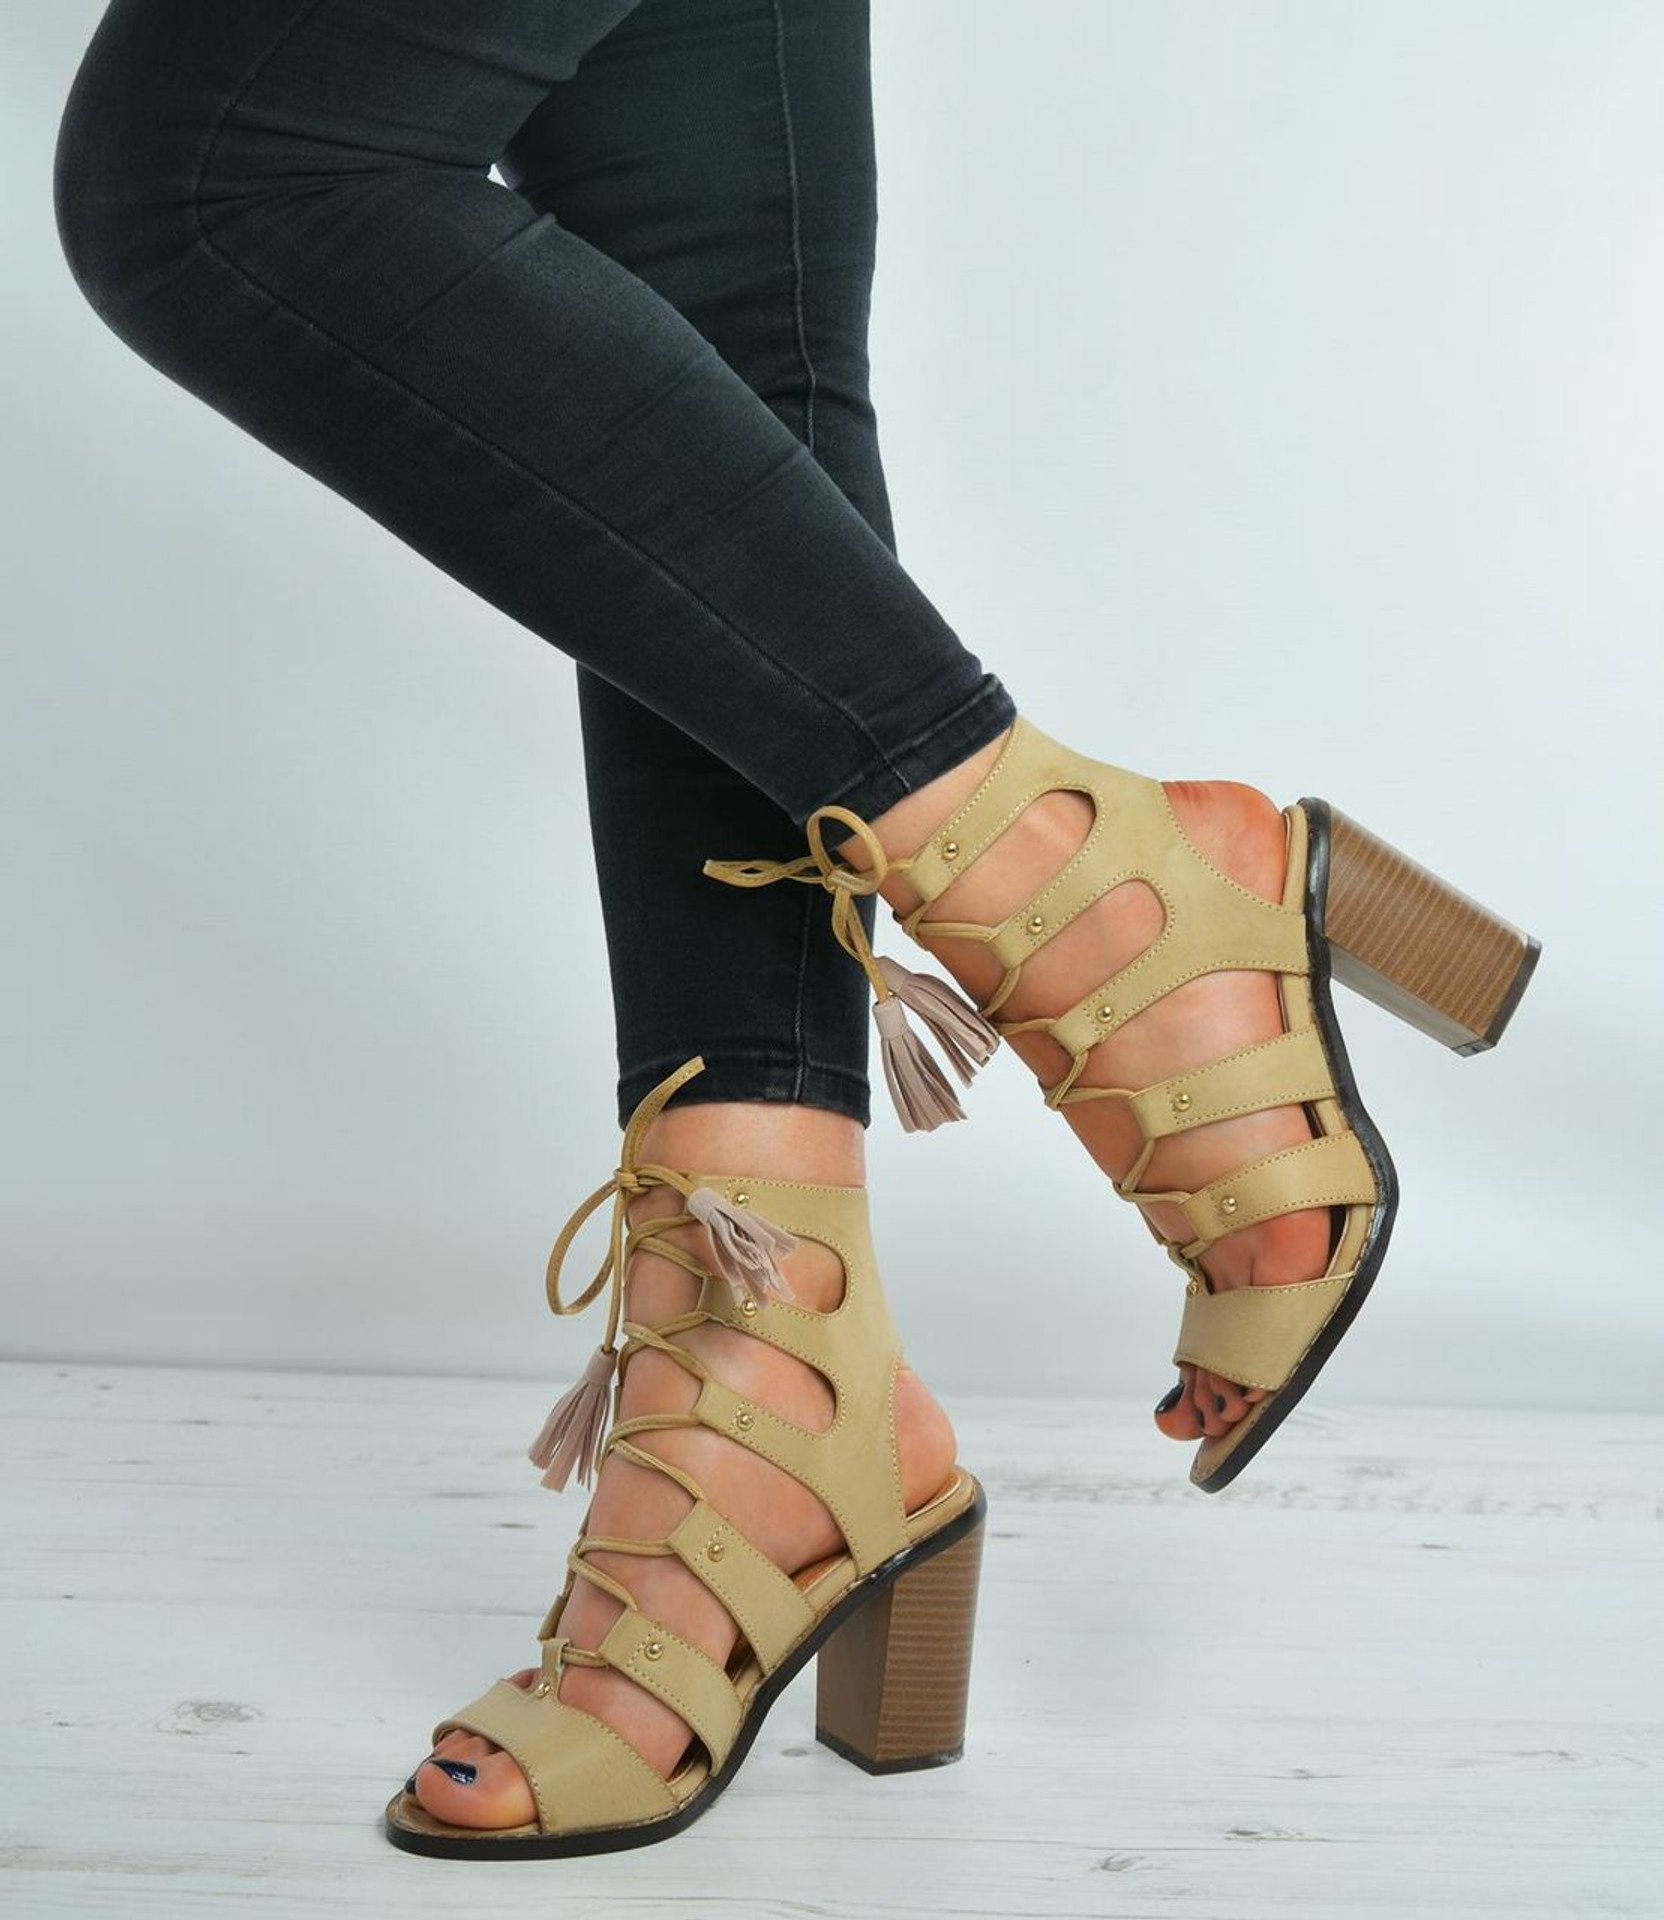 Christine Beige Gladiator Lace Up Sandals